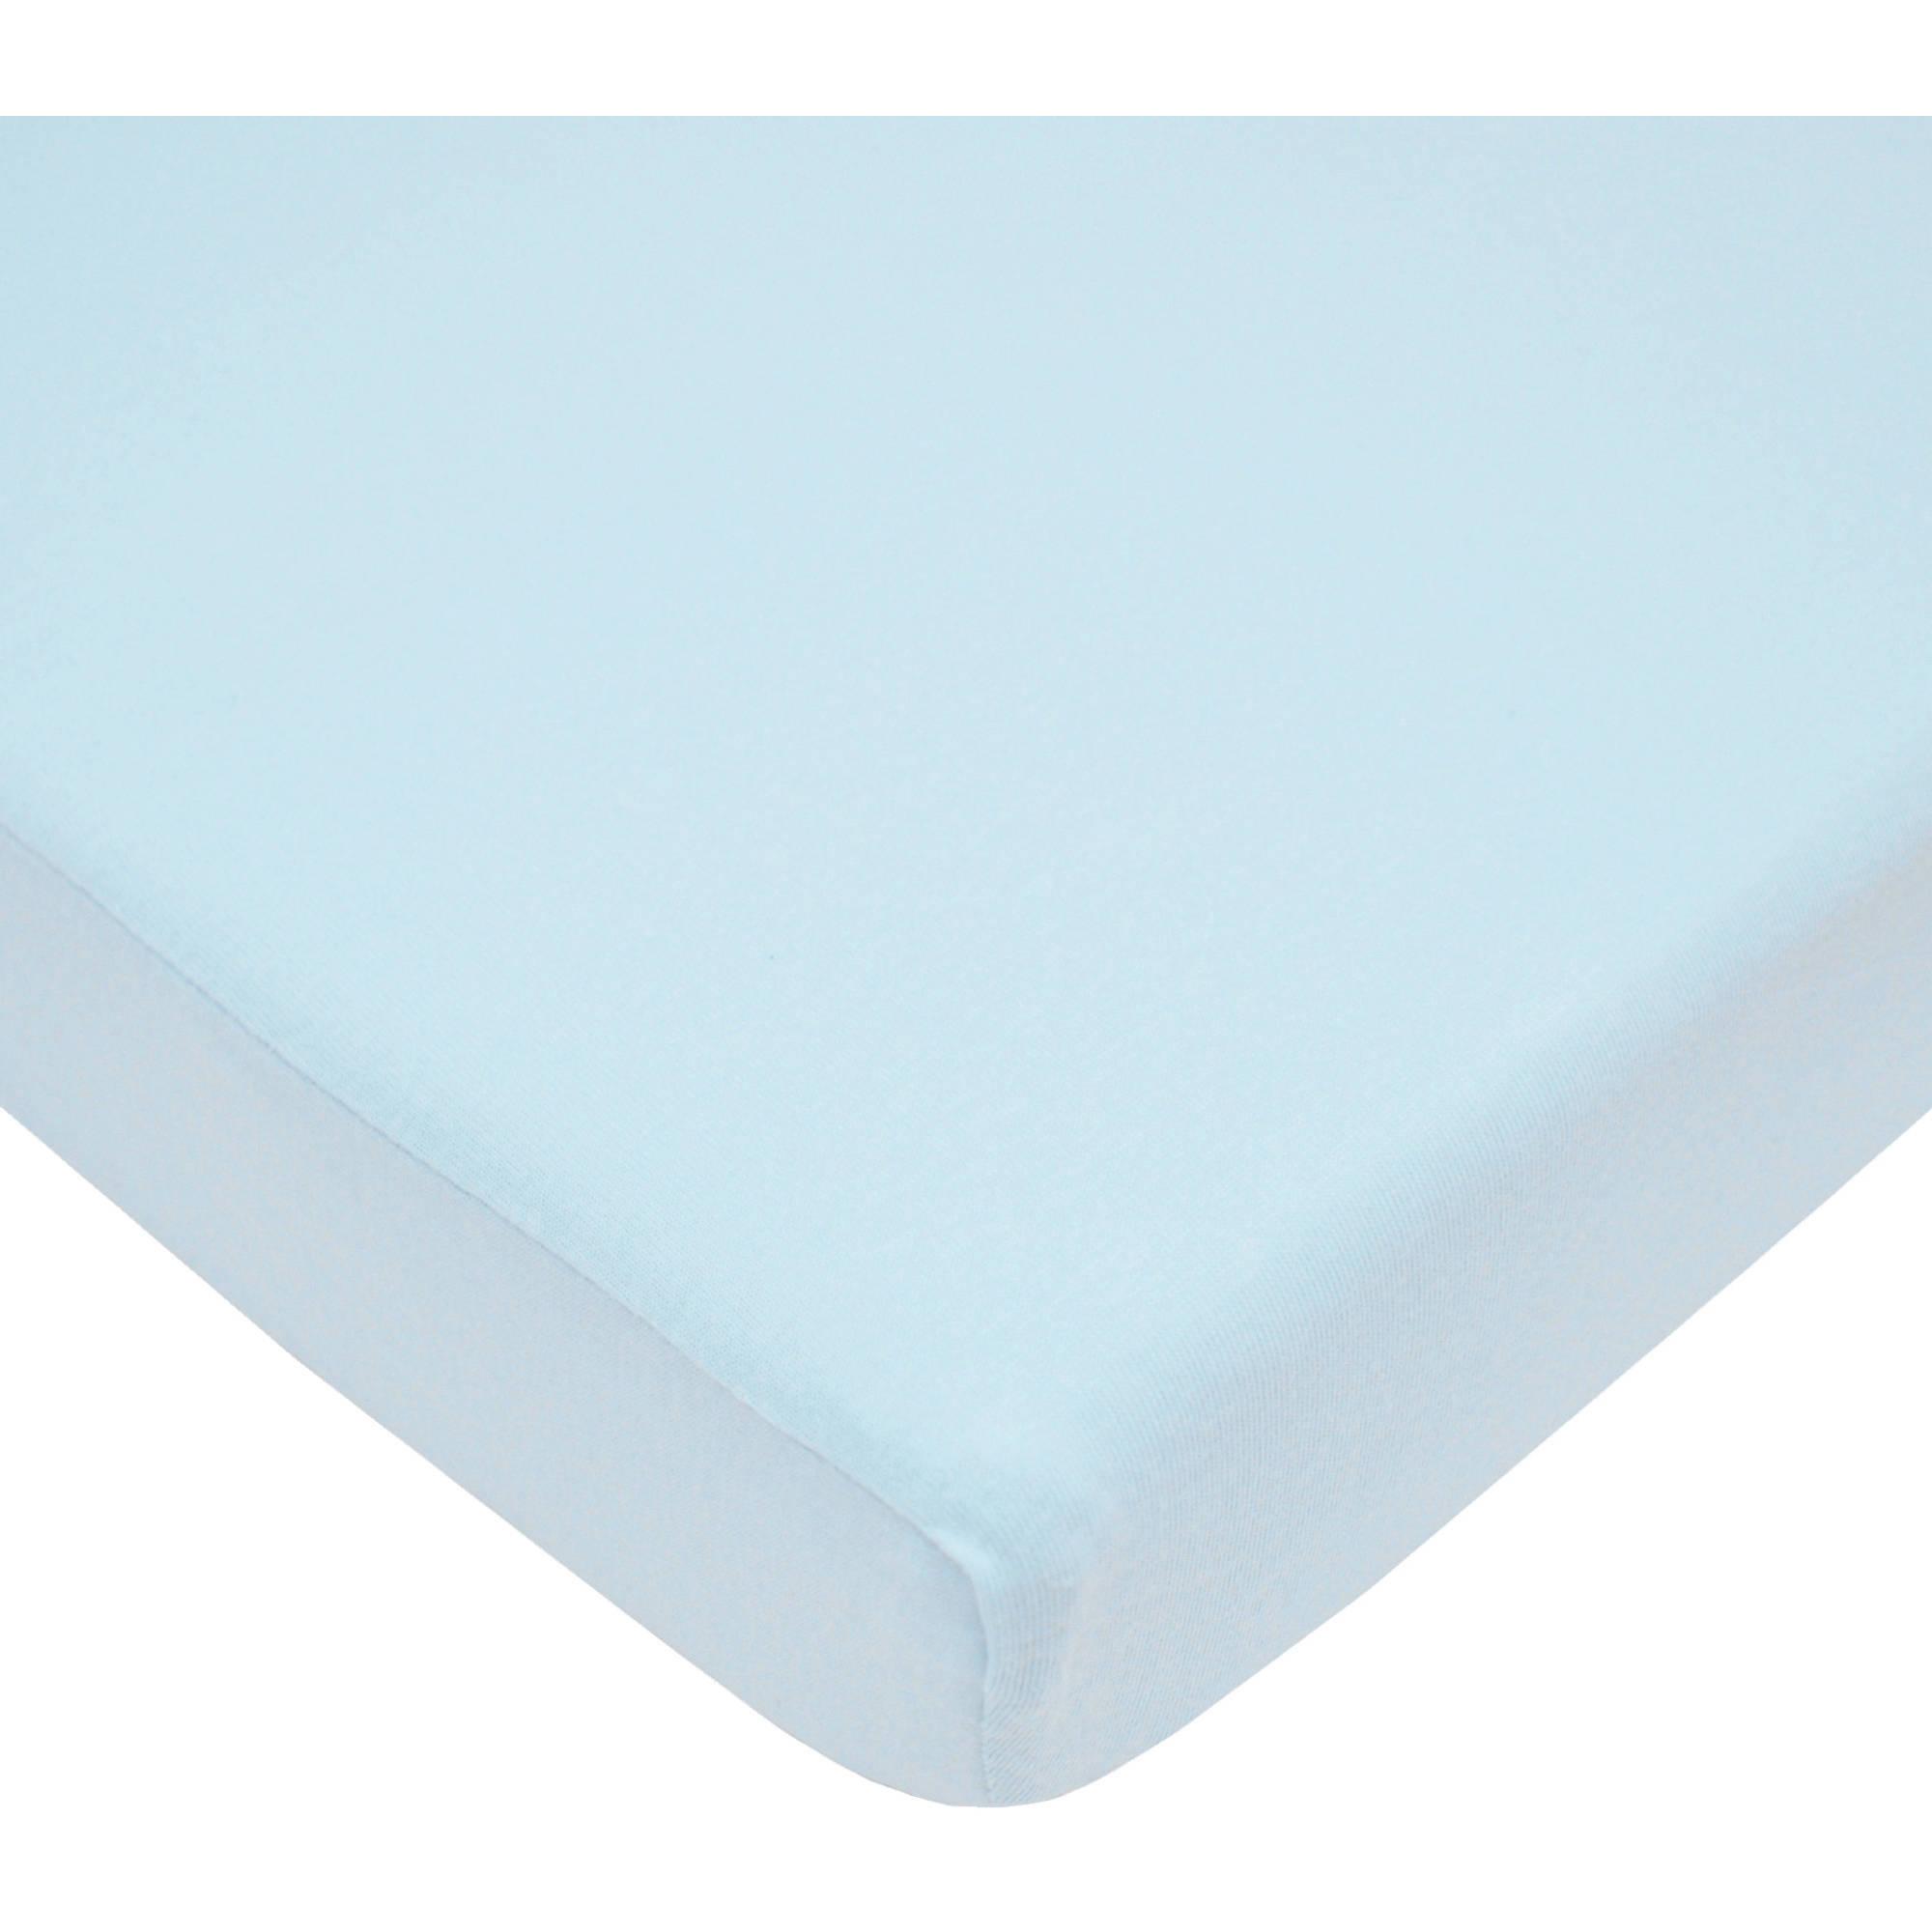 TL Care 100 Percent Cotton Jersey Knit Mini Crib Sheet, Blue